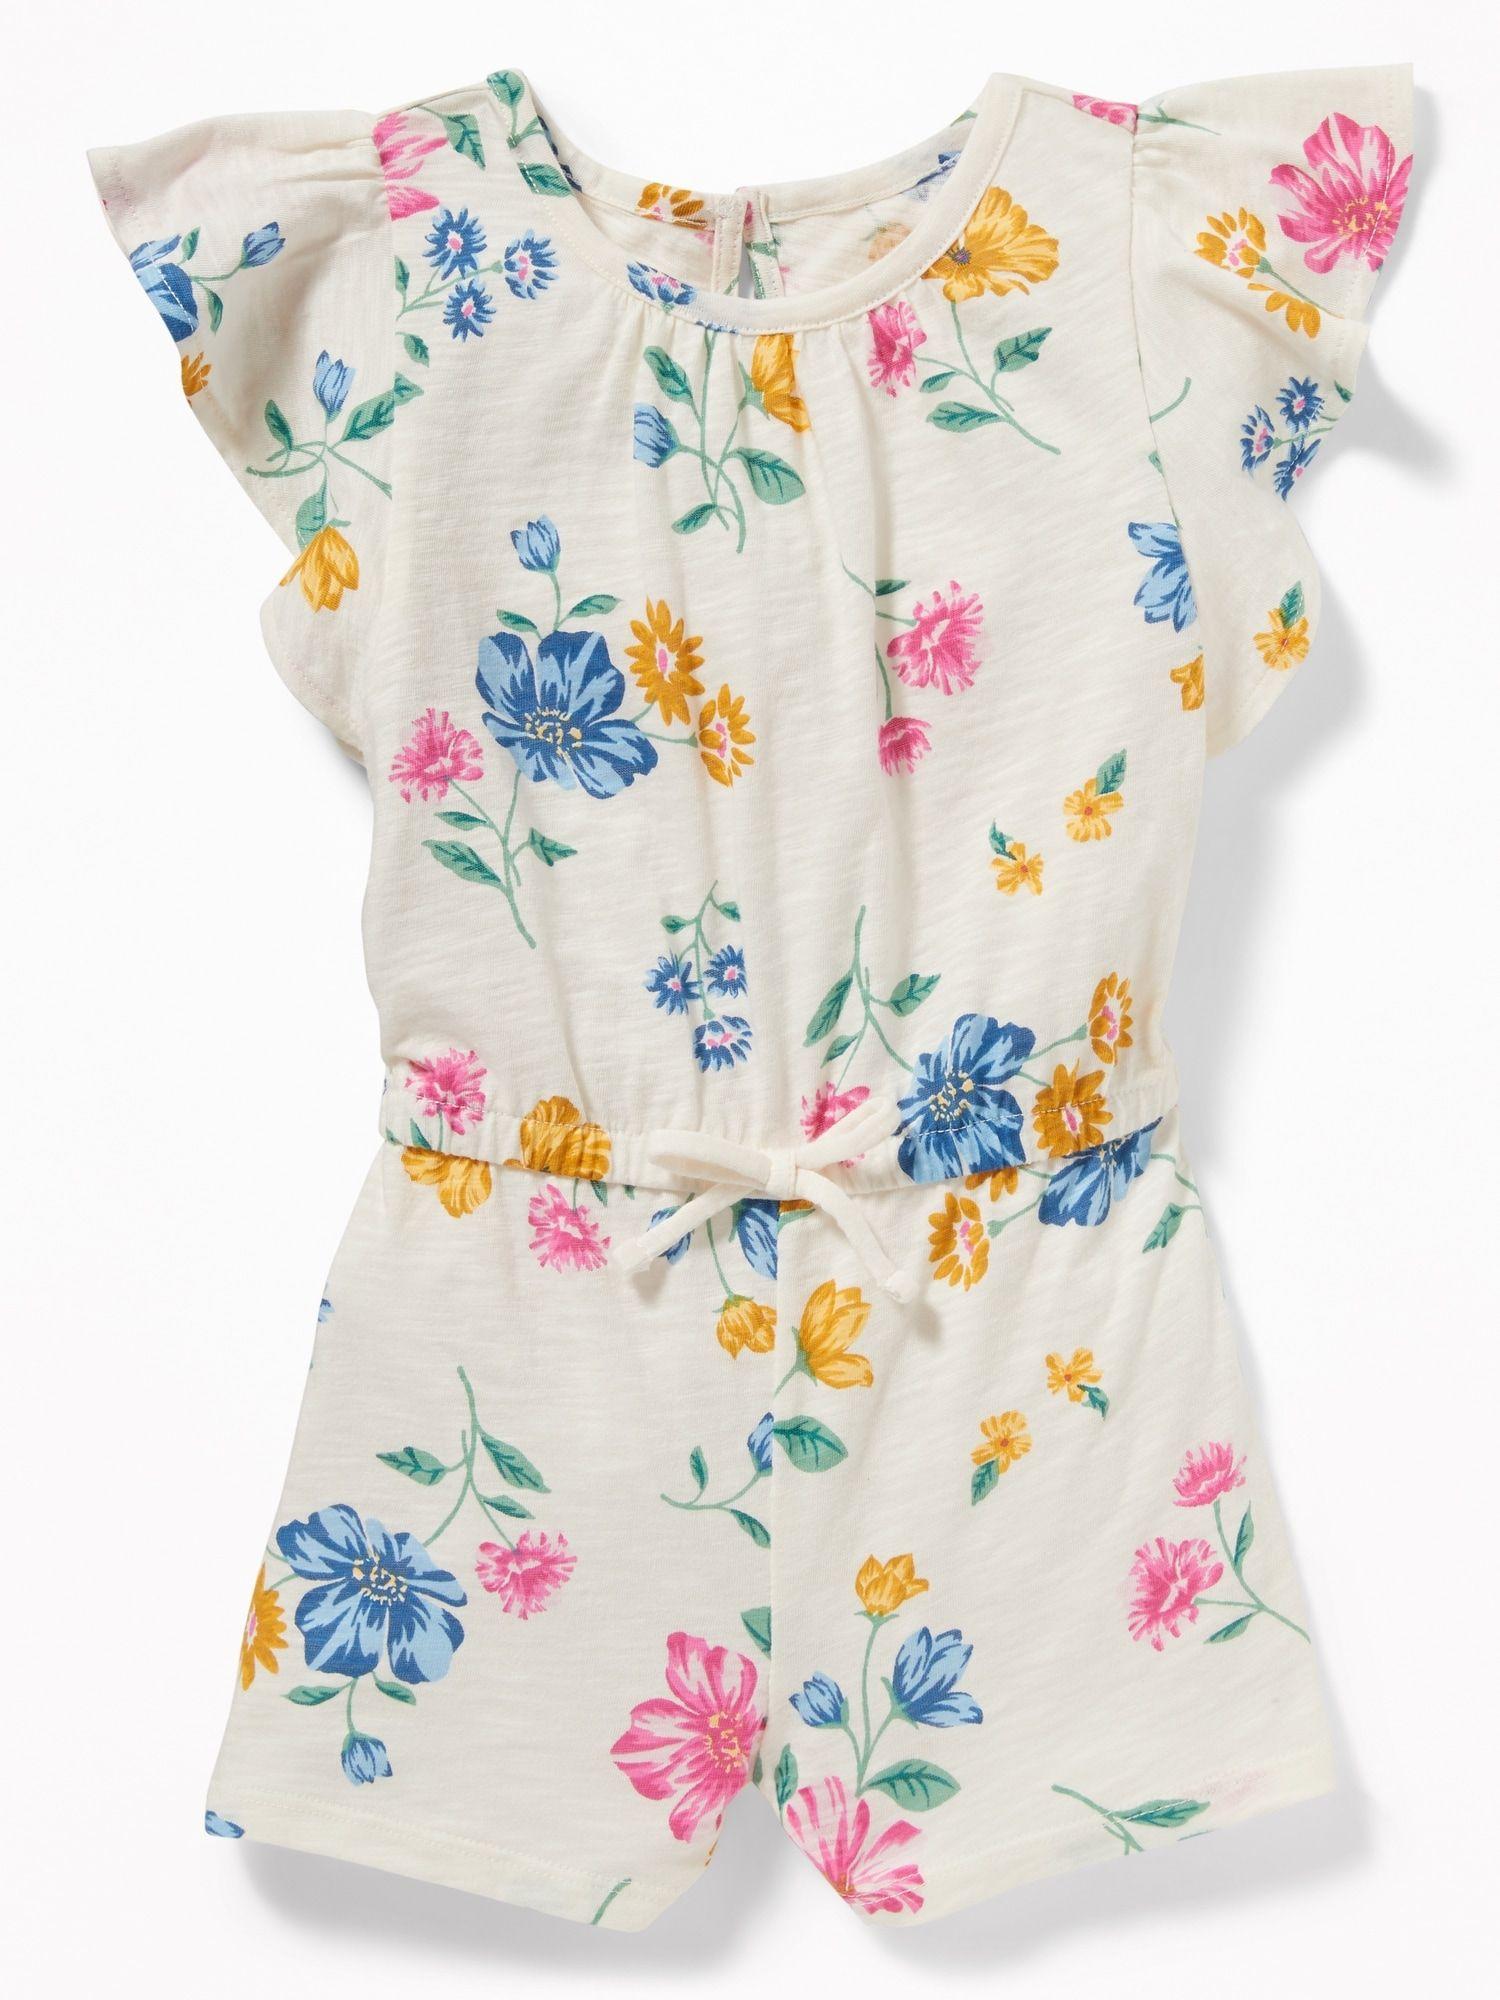 Printed Slub Knit Jersey Romper For Toddler Girls Rompers